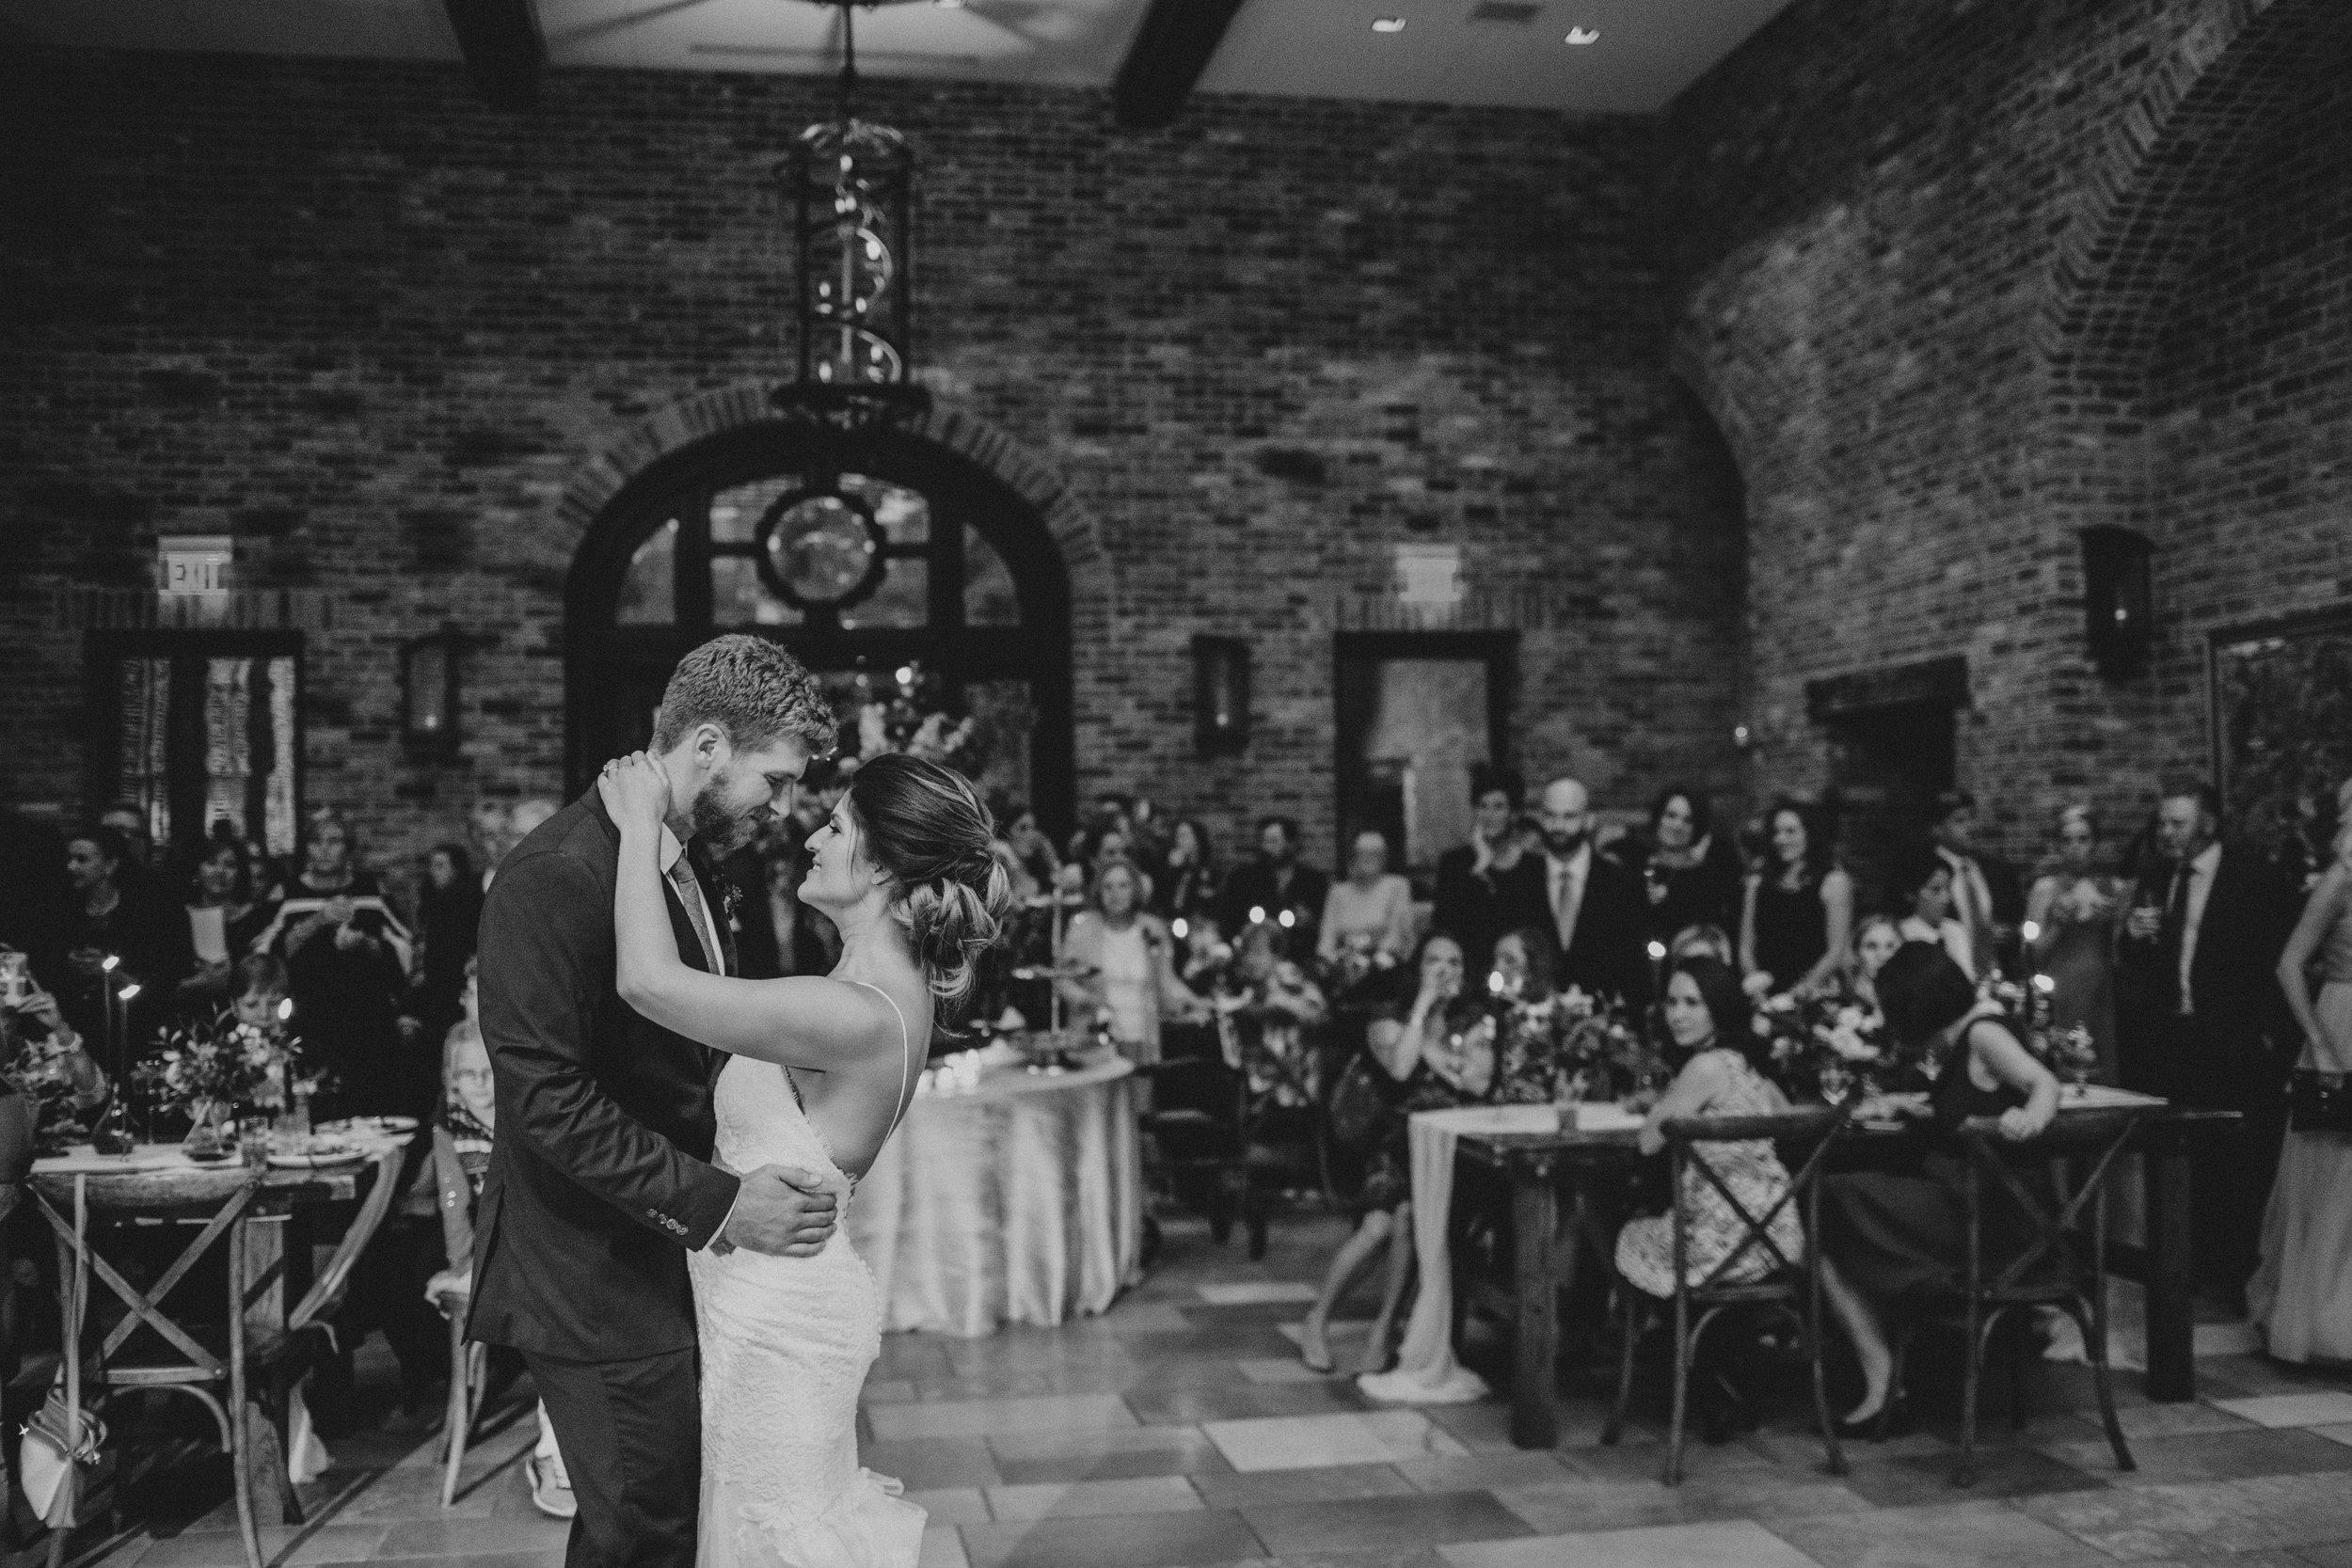 1070_ElizabethRyan_Wedding_AmyCampbellPhotography.jpg